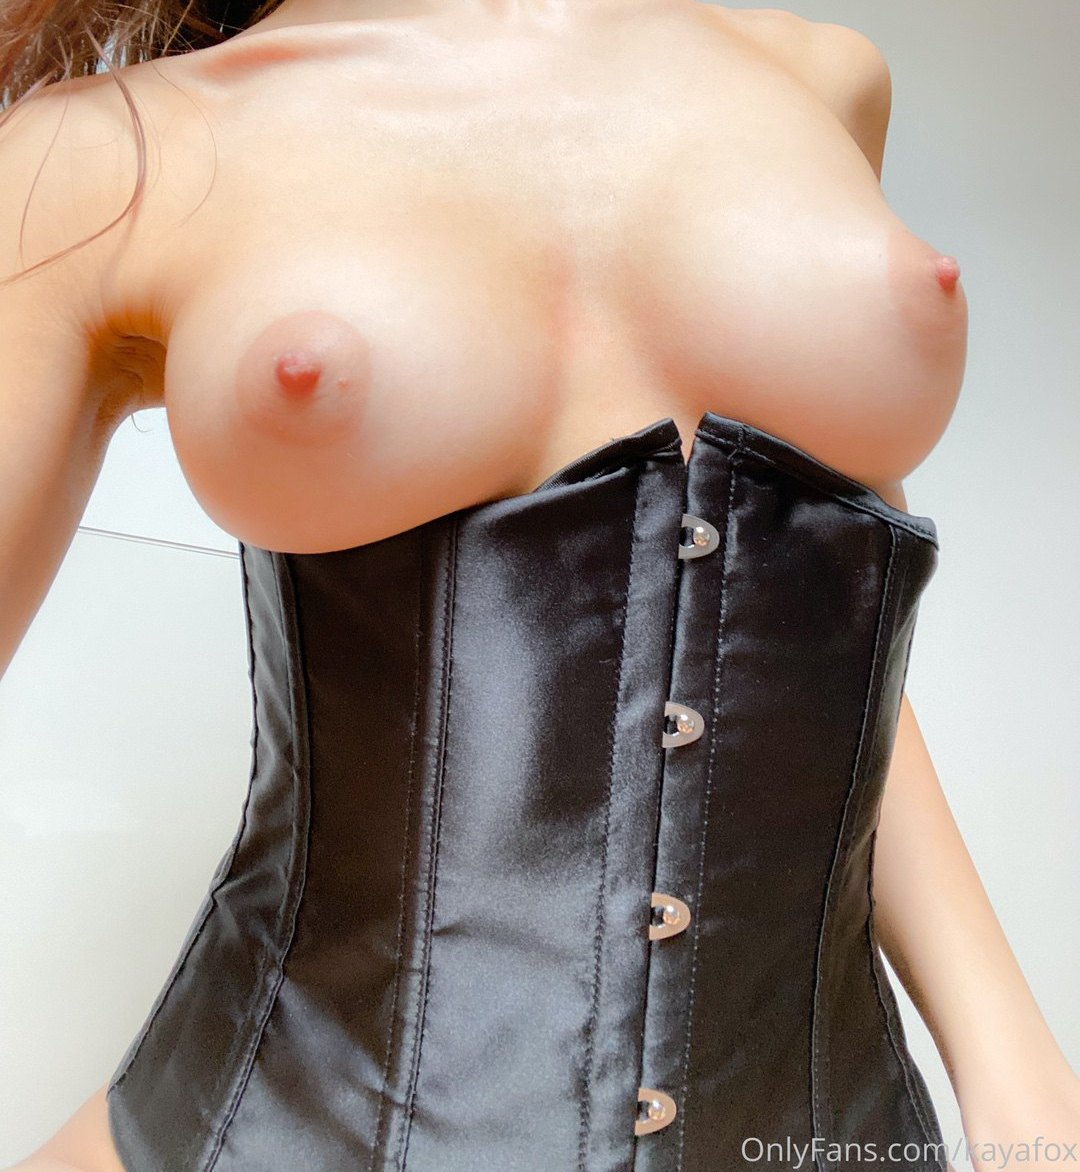 Kaya Fox Kayafox Onlyfans Nudes Leaks 0008